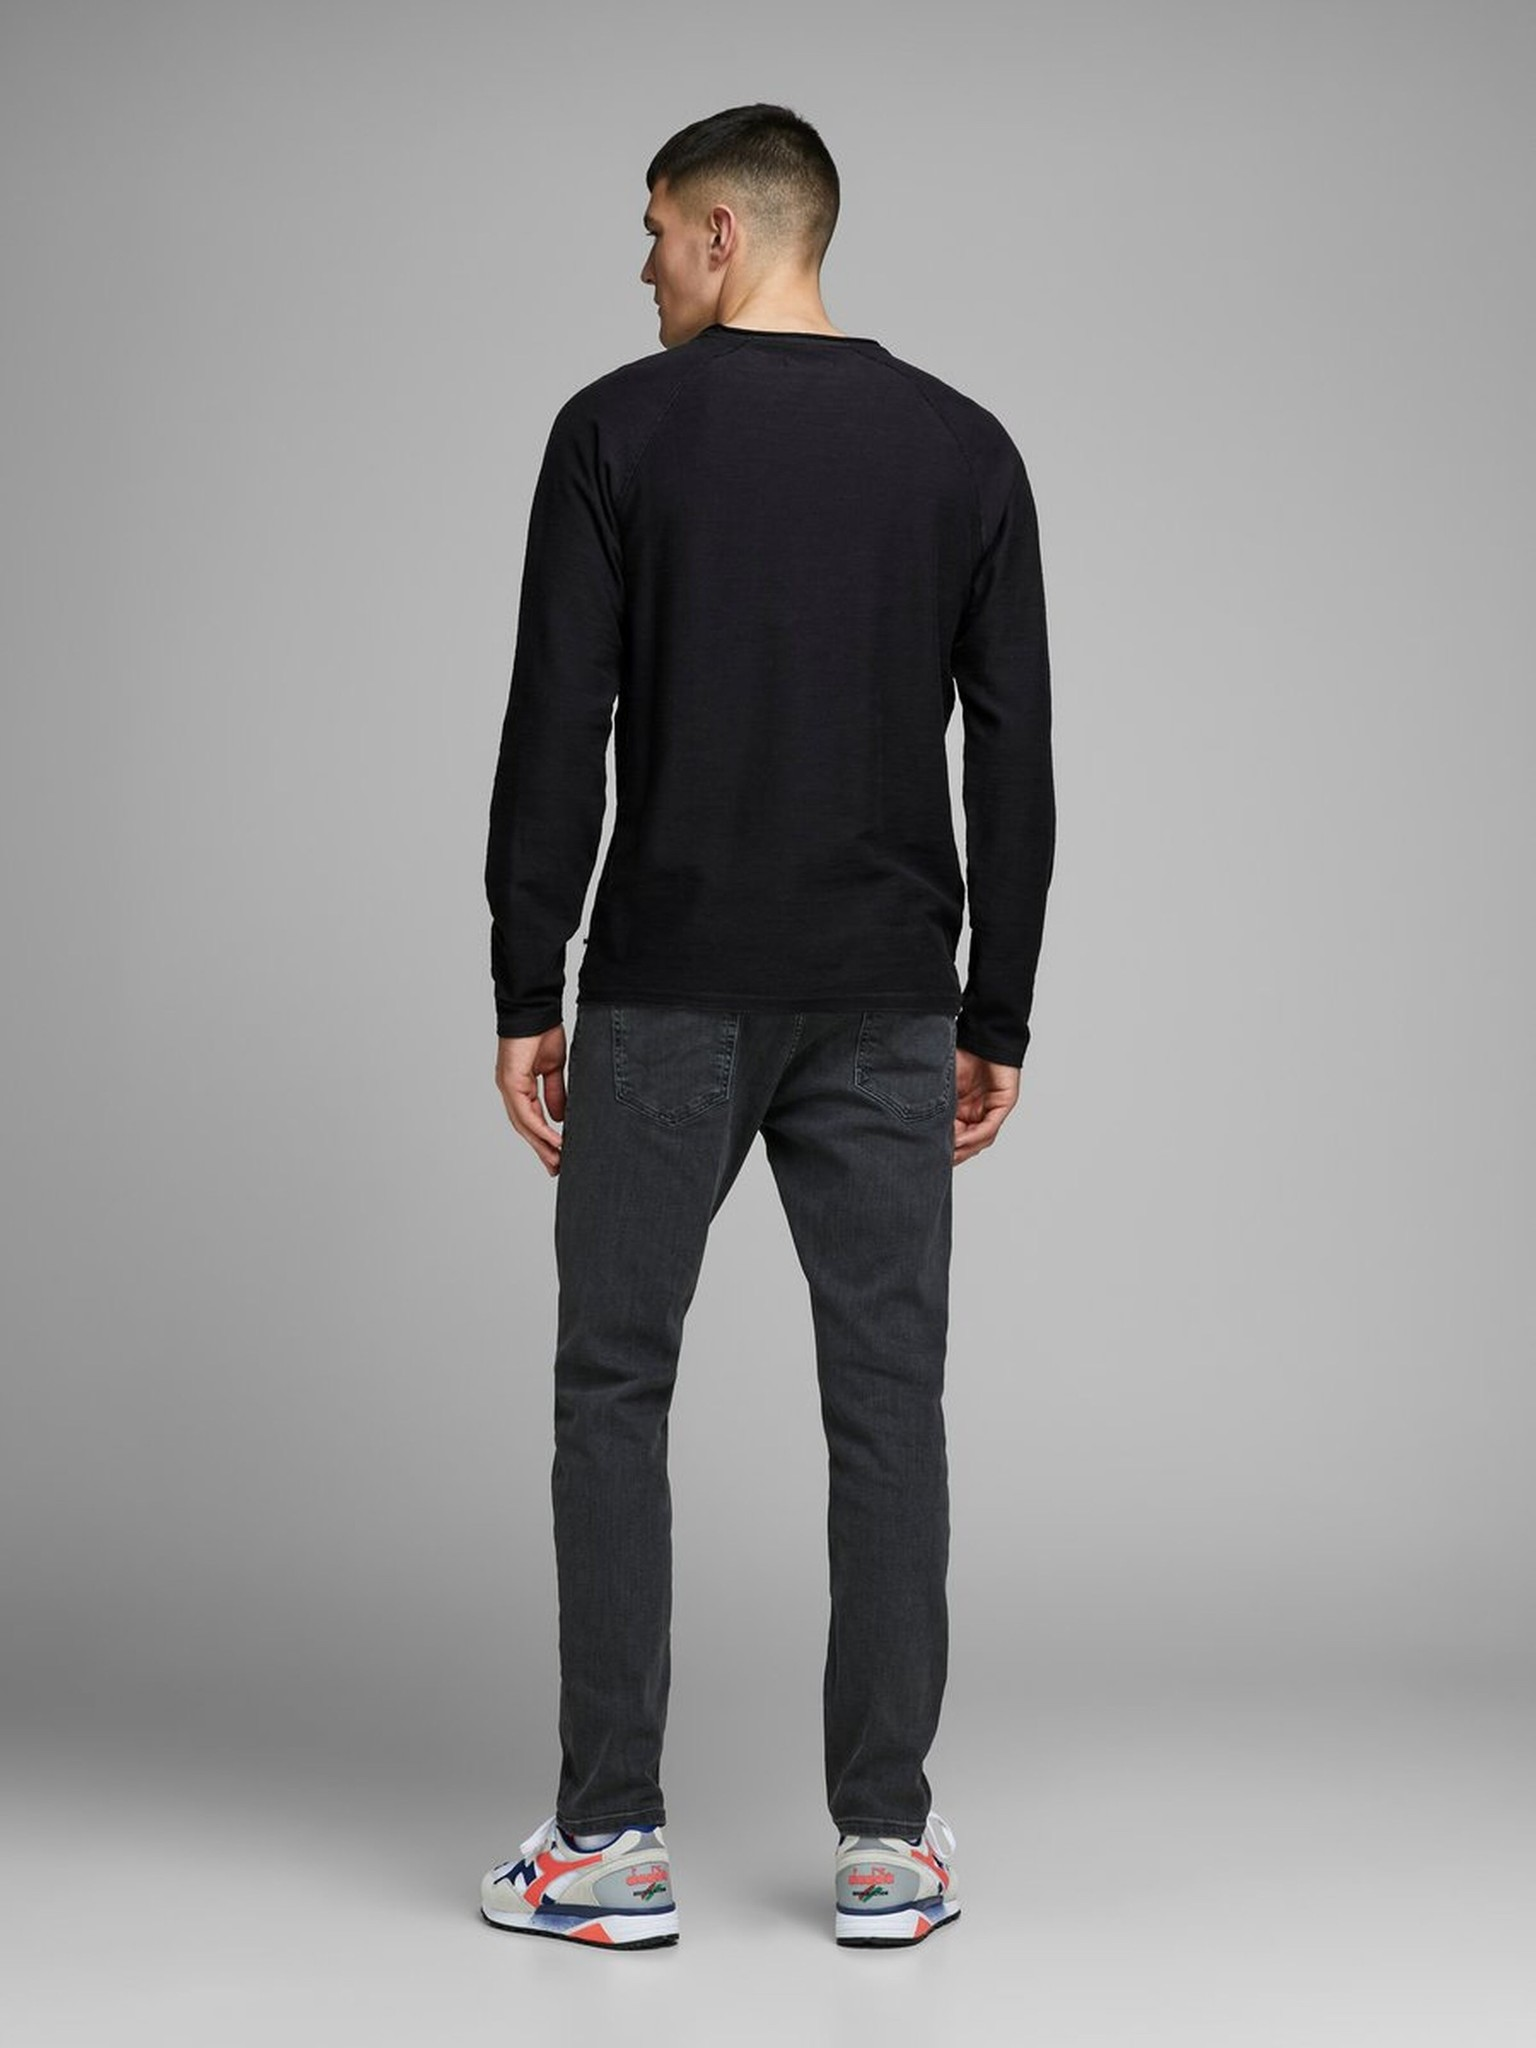 JACK & JONES col ras-du-cou sweat-shirt-8